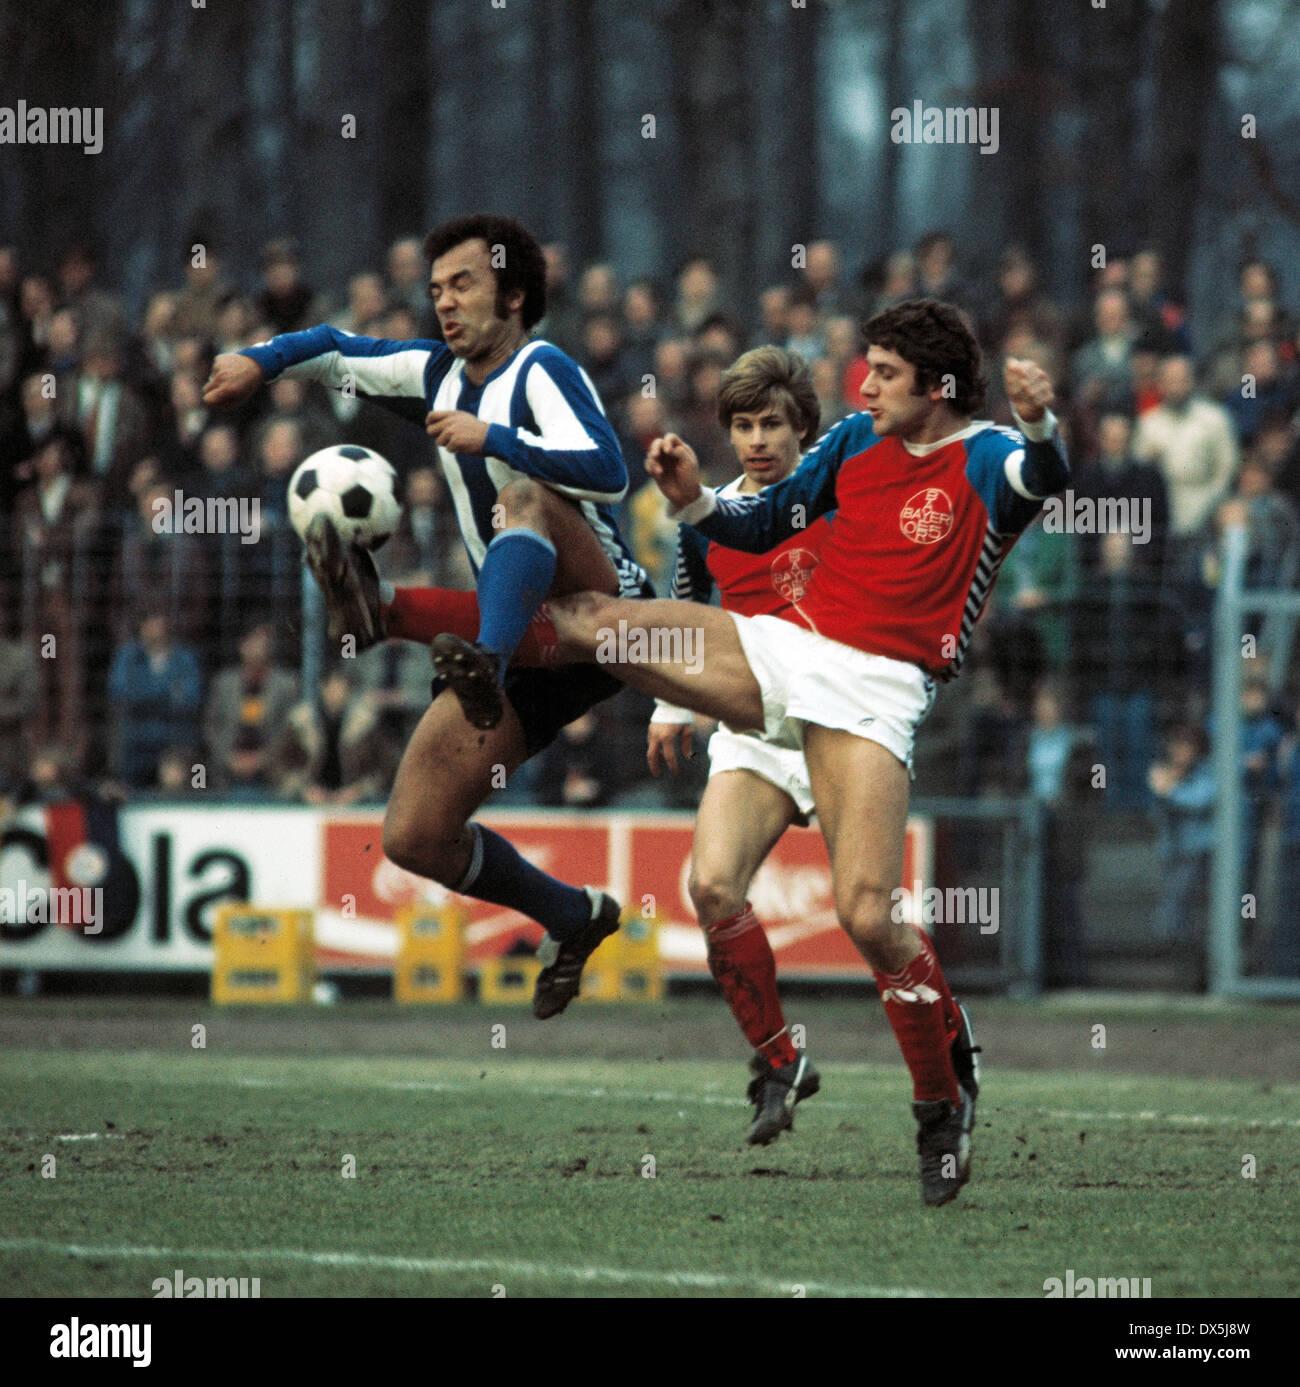 football, Bundesliga, 1975/1976, Grotenburg Stadium, FC Bayer 05 Uerdingen versus Hertha BSC Berlin 1:1, scene of the match, tackling, Erwin Kostedde (Hertha) left and Paul Hahn (05), behind Norbert Brinkmann (05) - Stock Image